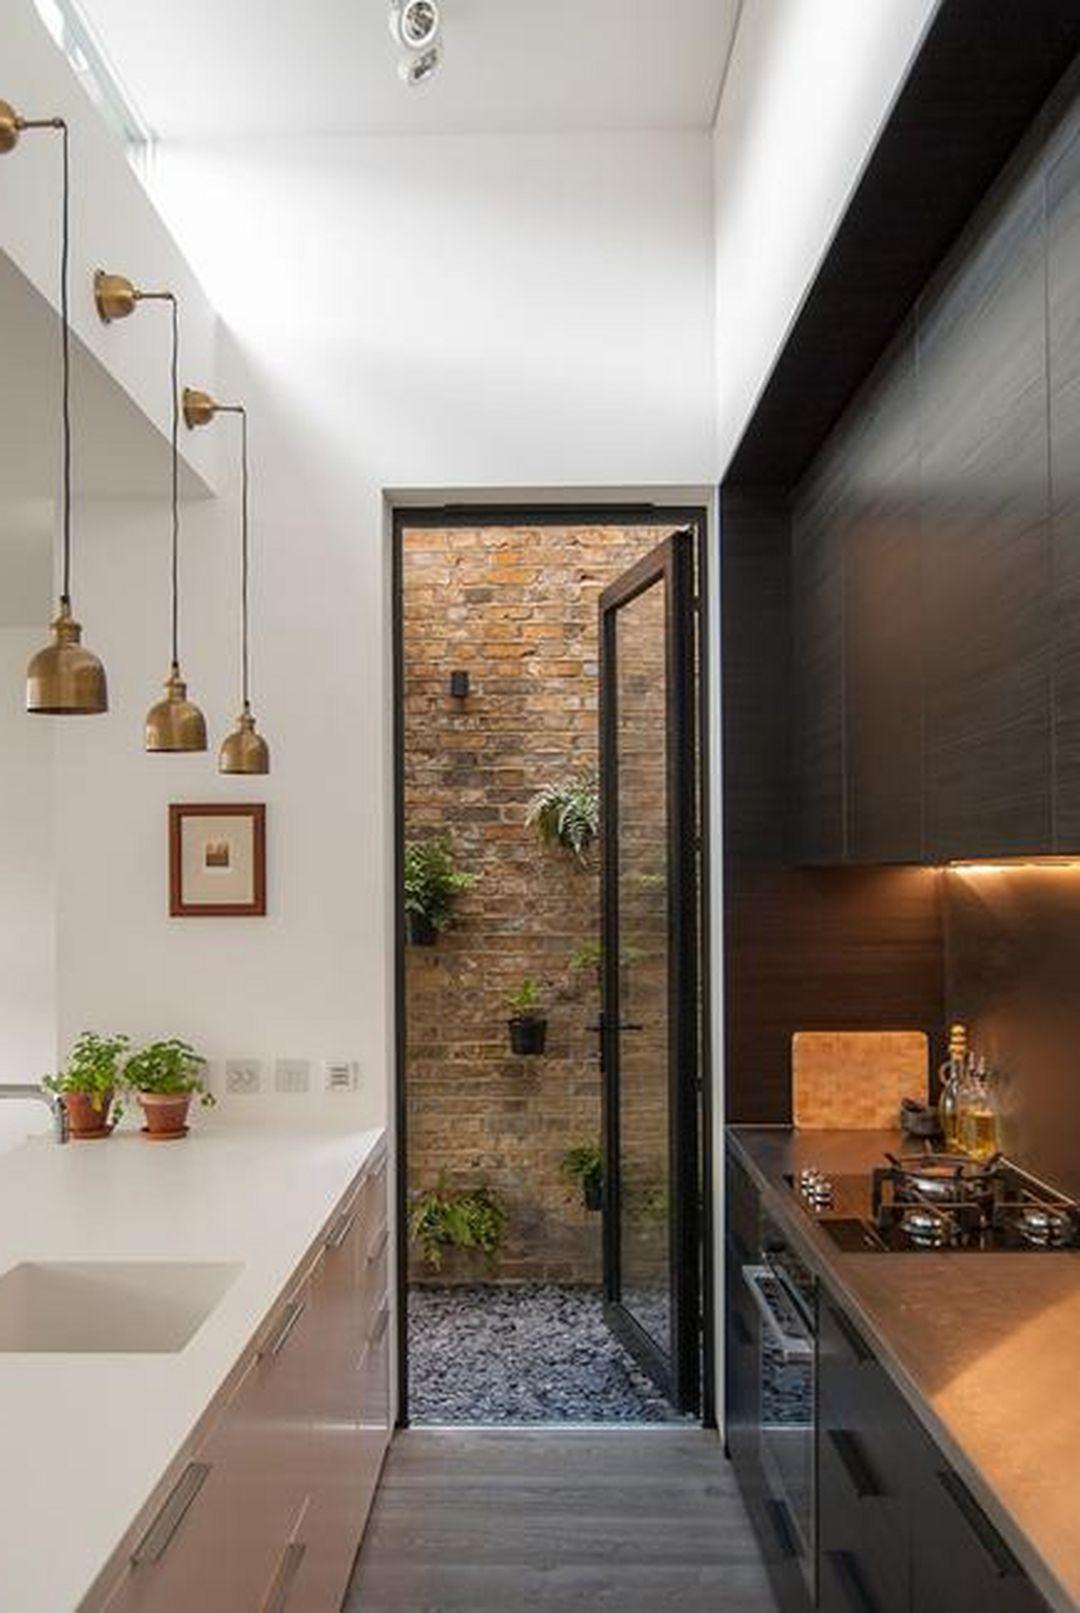 Best 15 Amazing Small Modern Kitchen Design Ideas Small 400 x 300